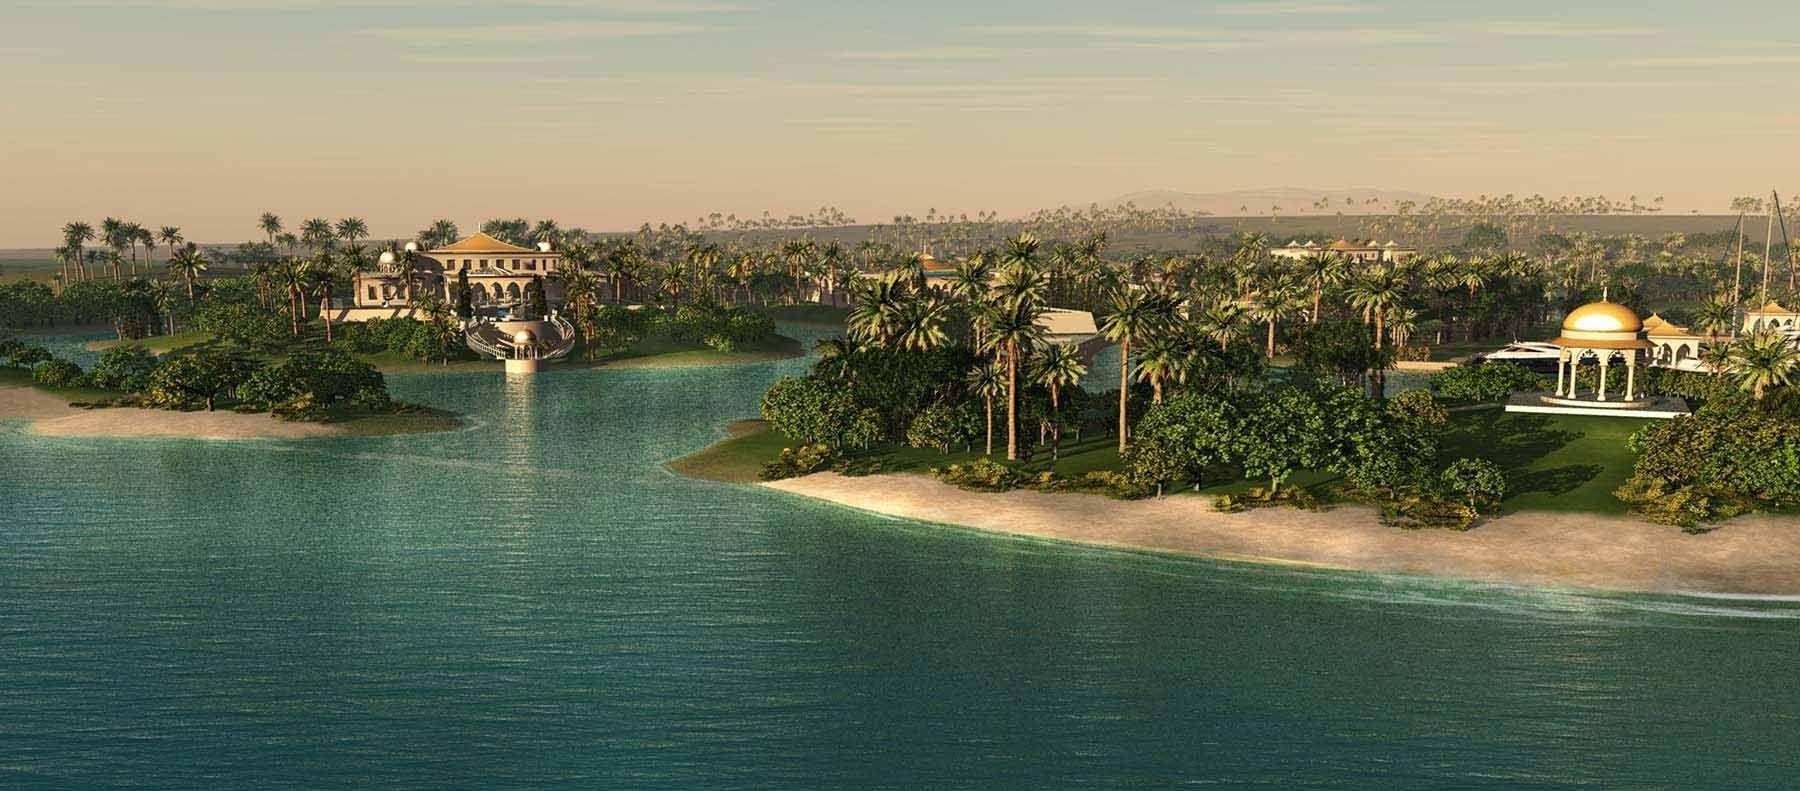 Private resort near Jeddah, Saudi Arabia